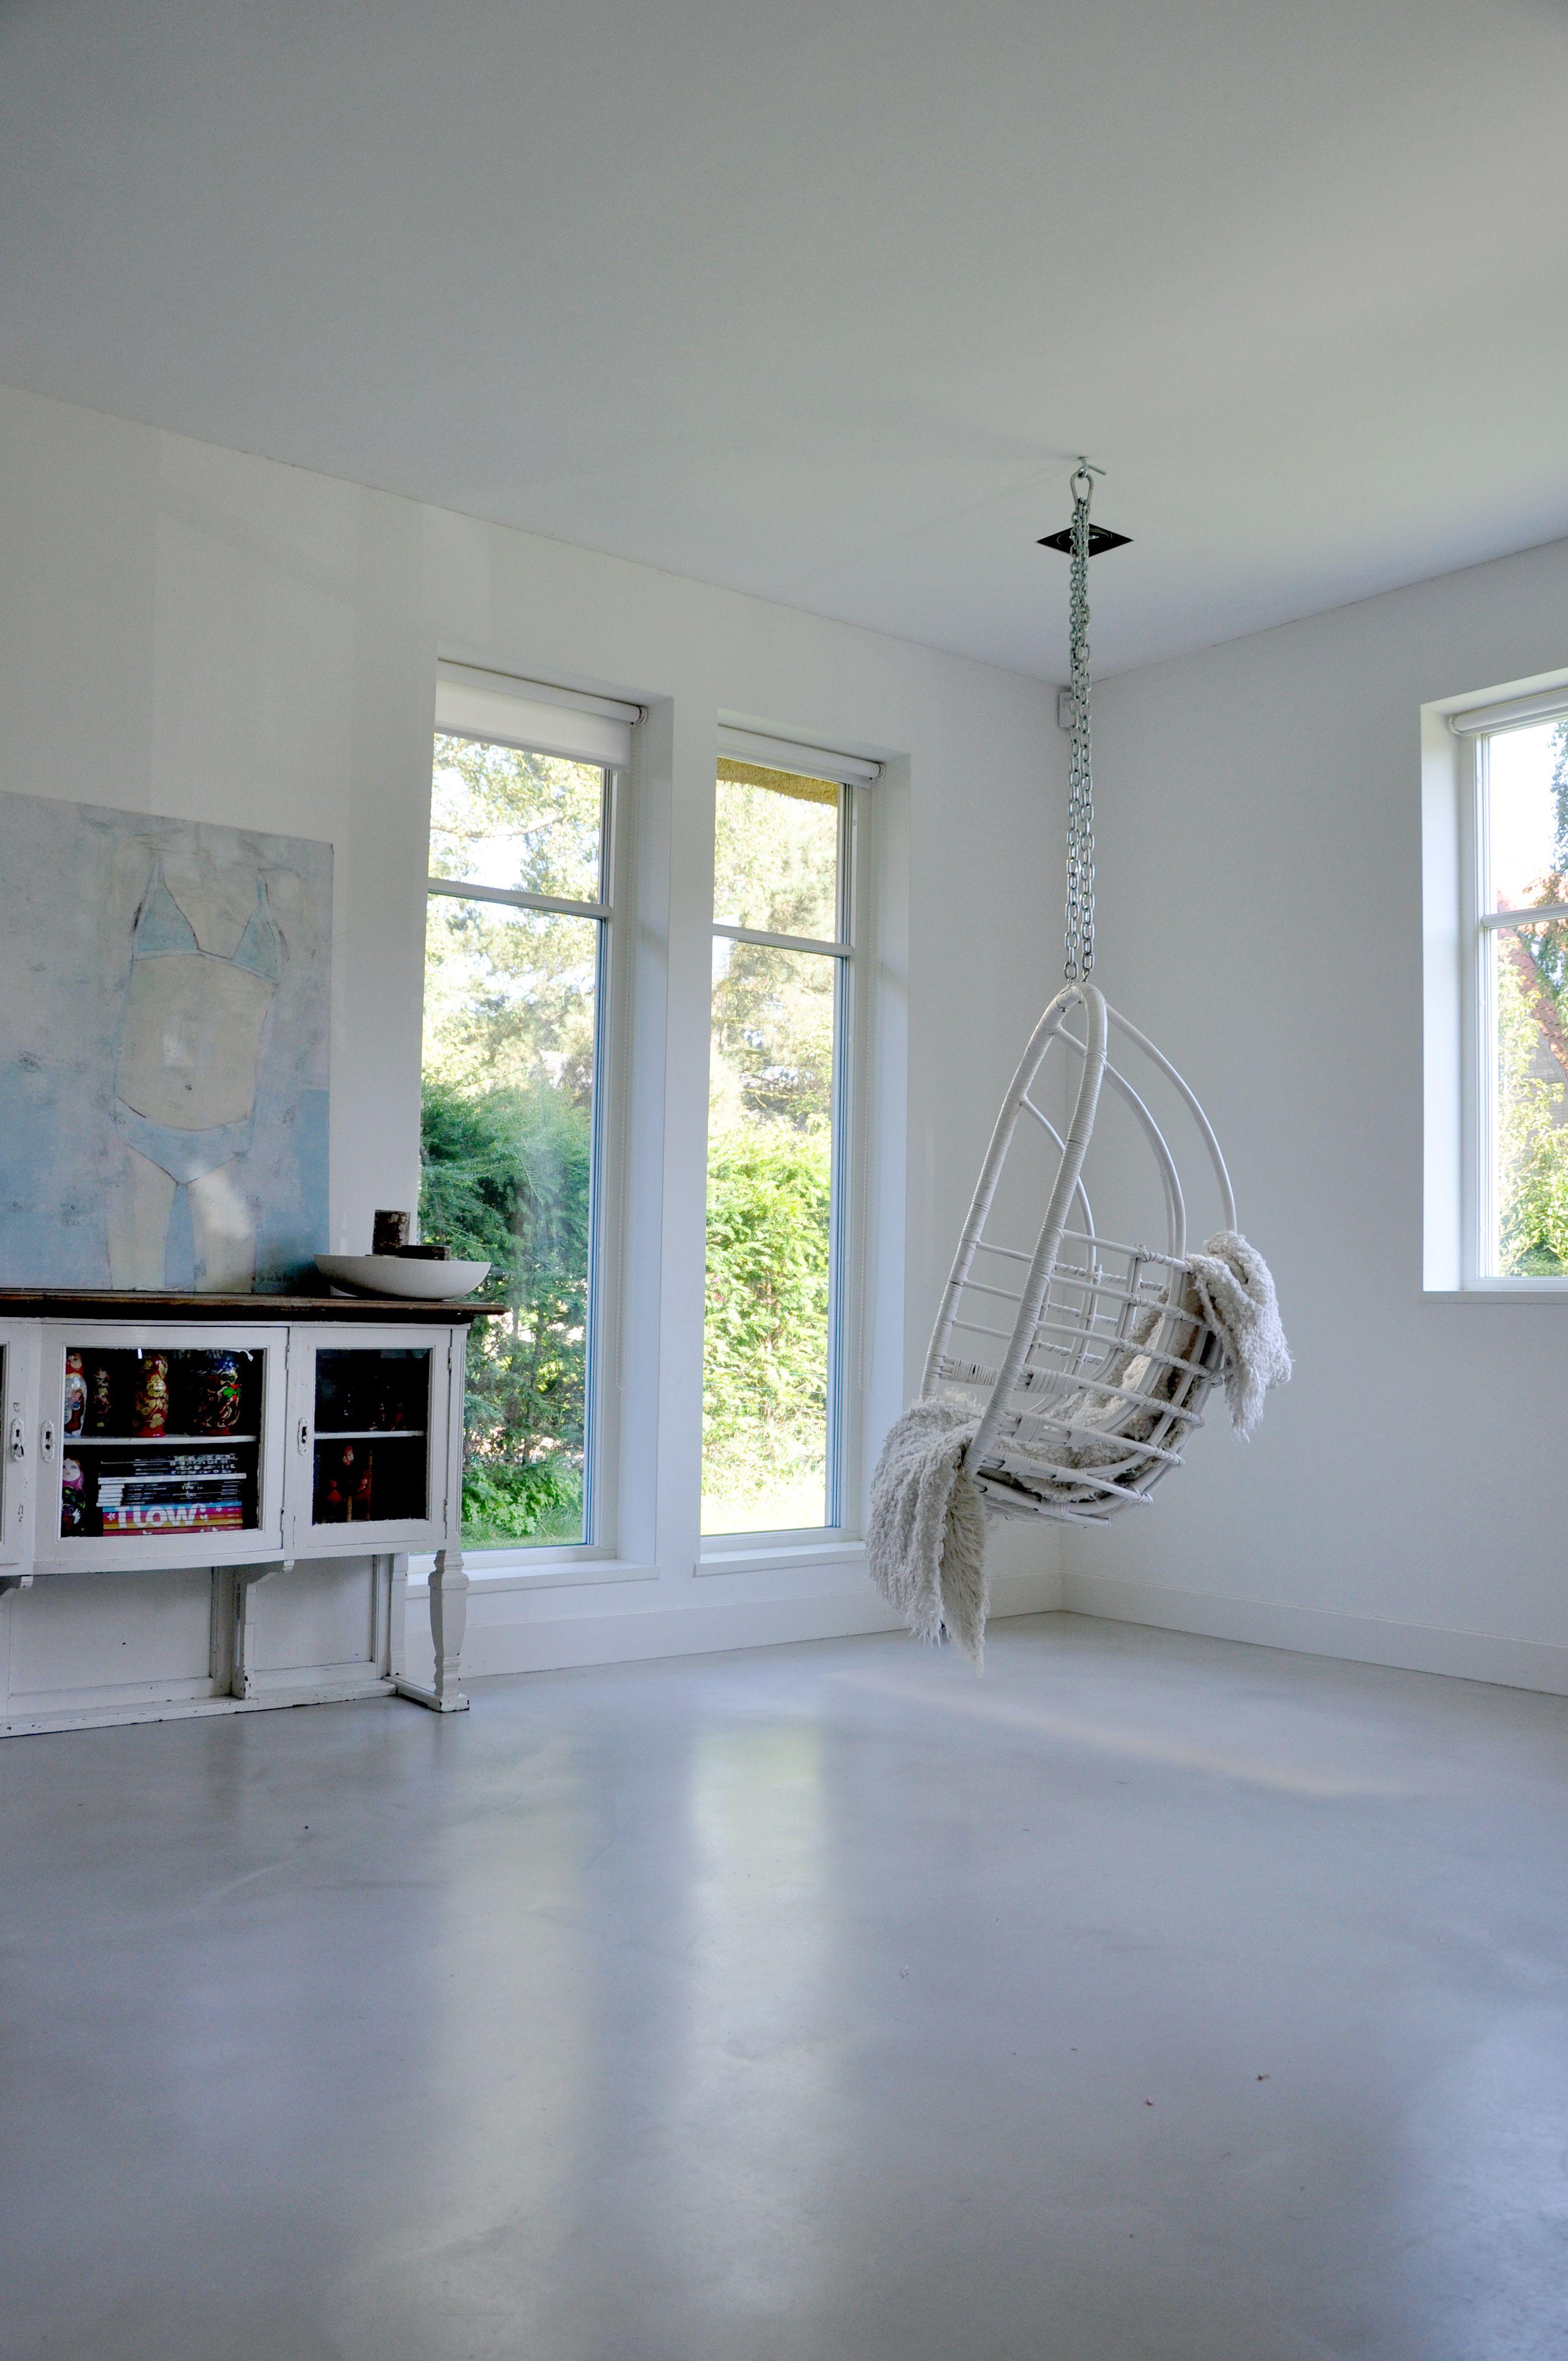 Interior Photography by Anjuska Slijderink ©